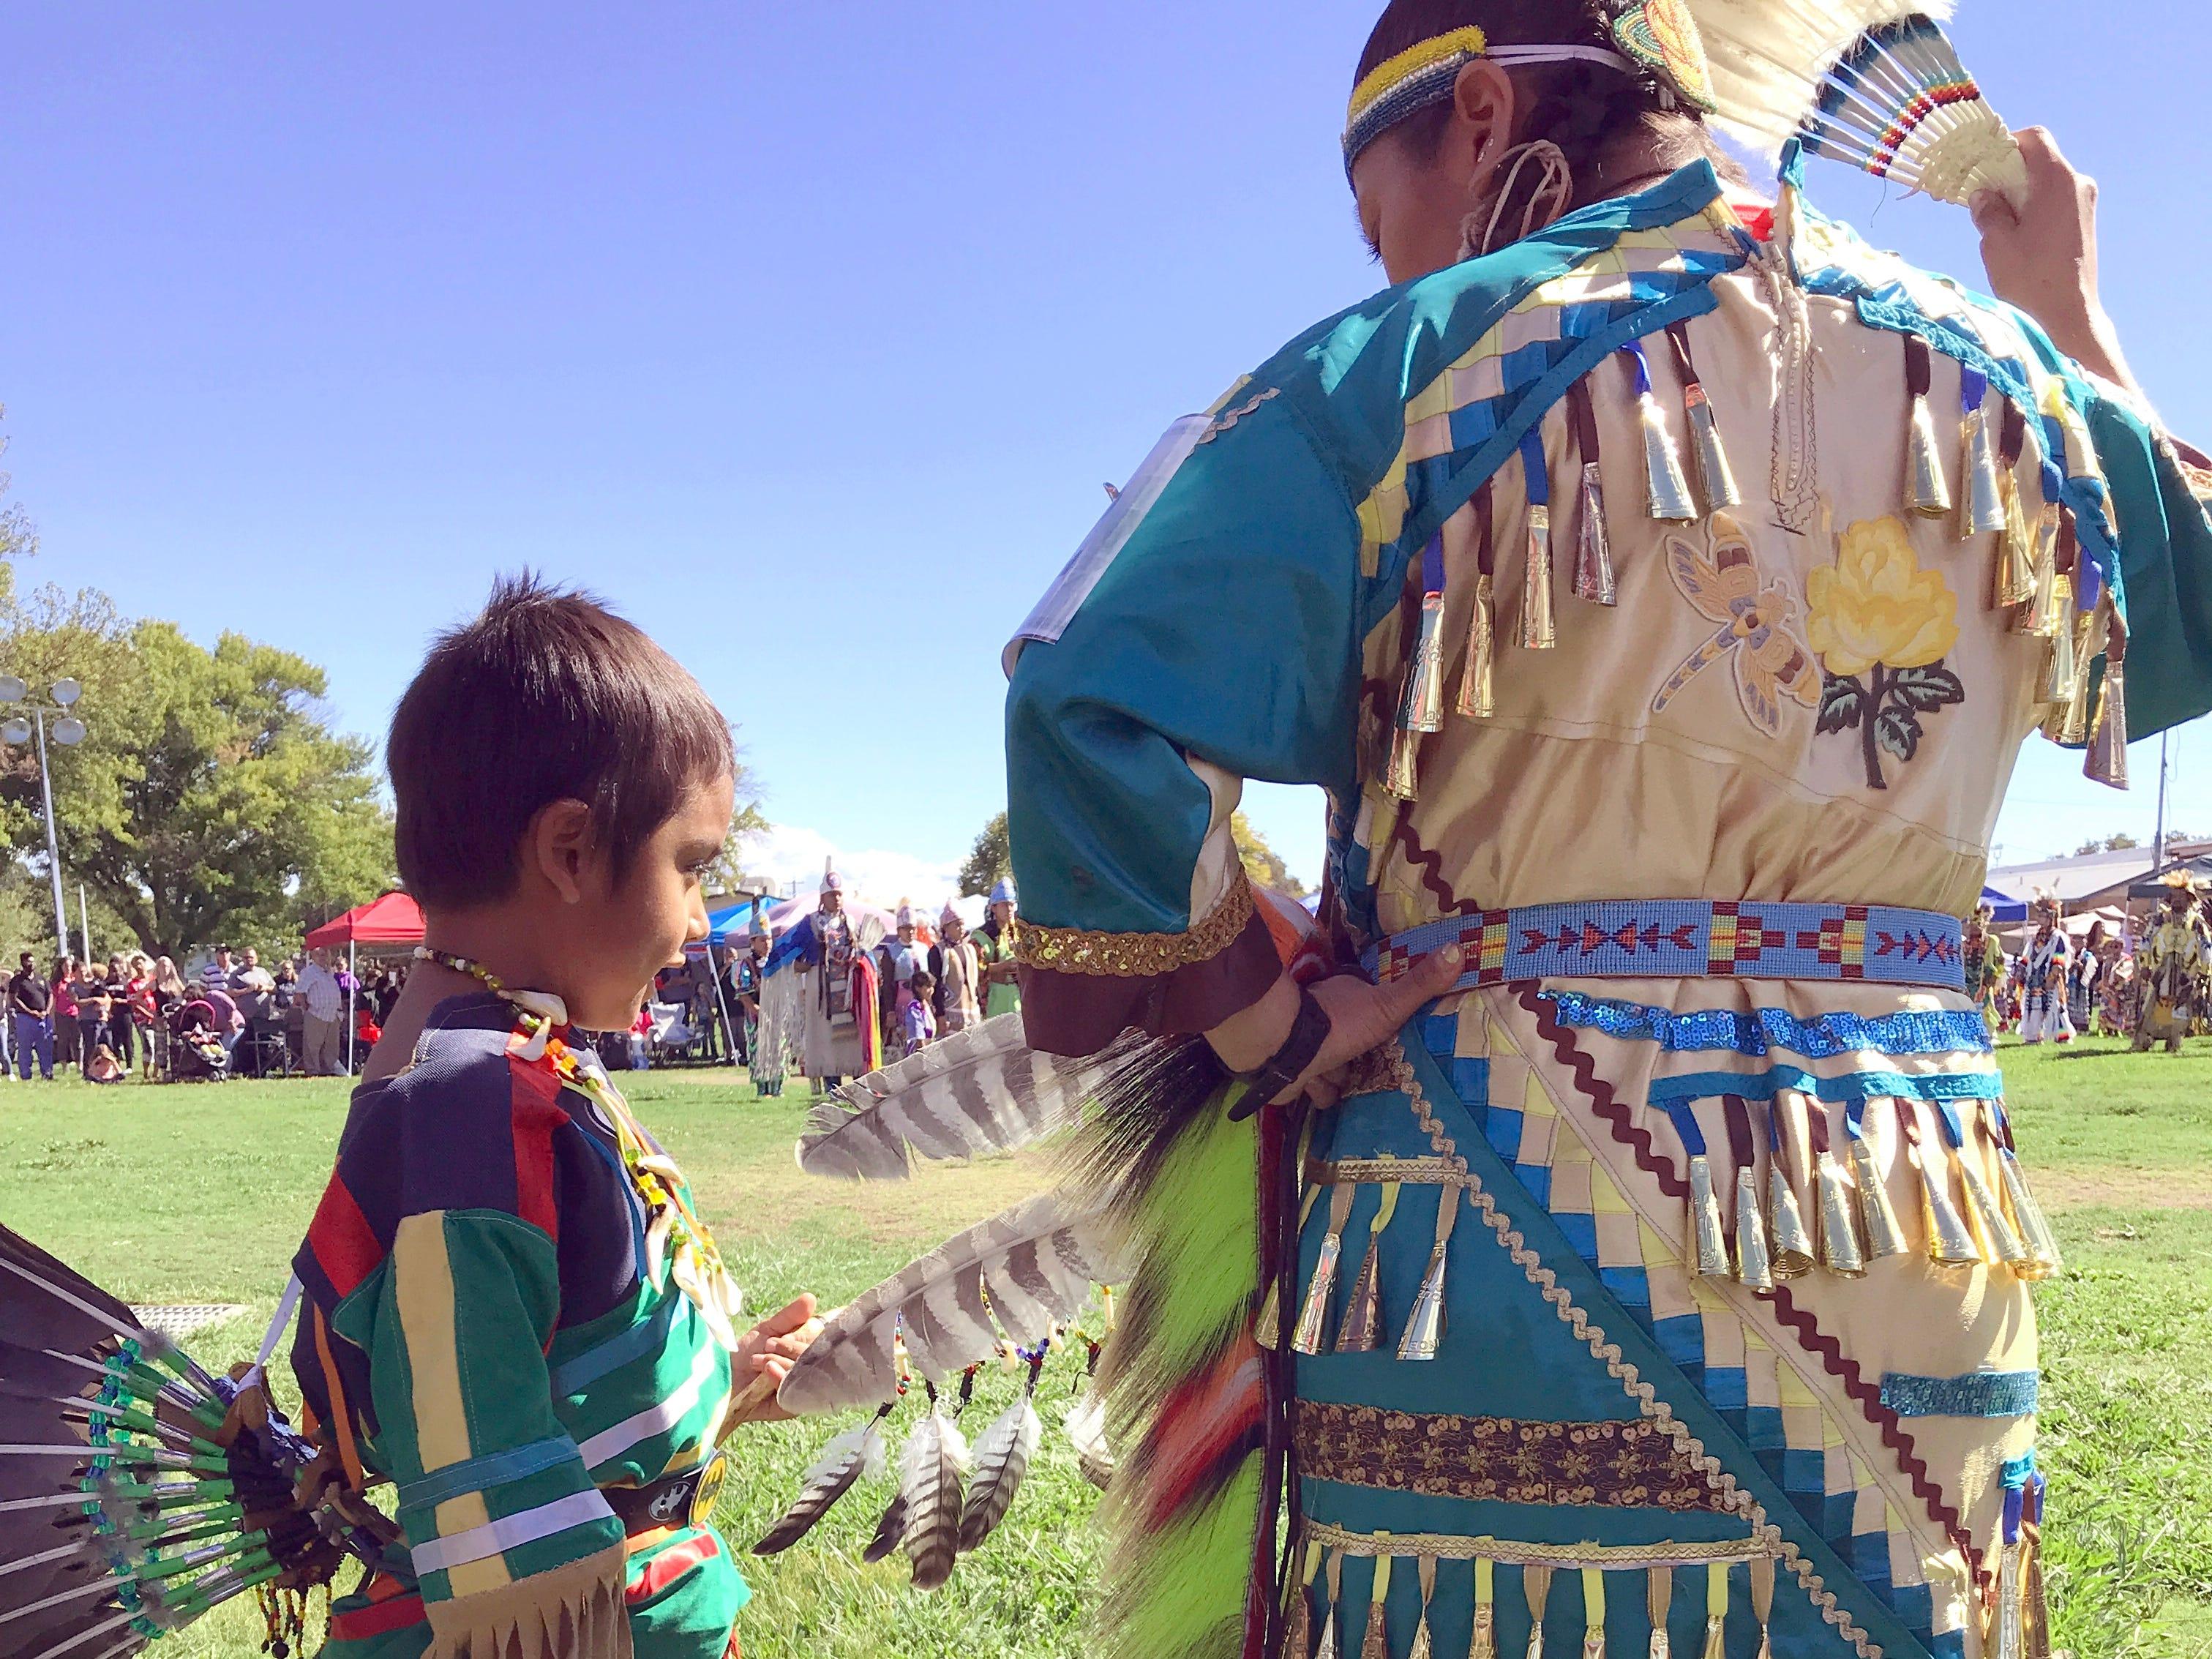 Two dancers at Saturday's Stillwater Powwow.